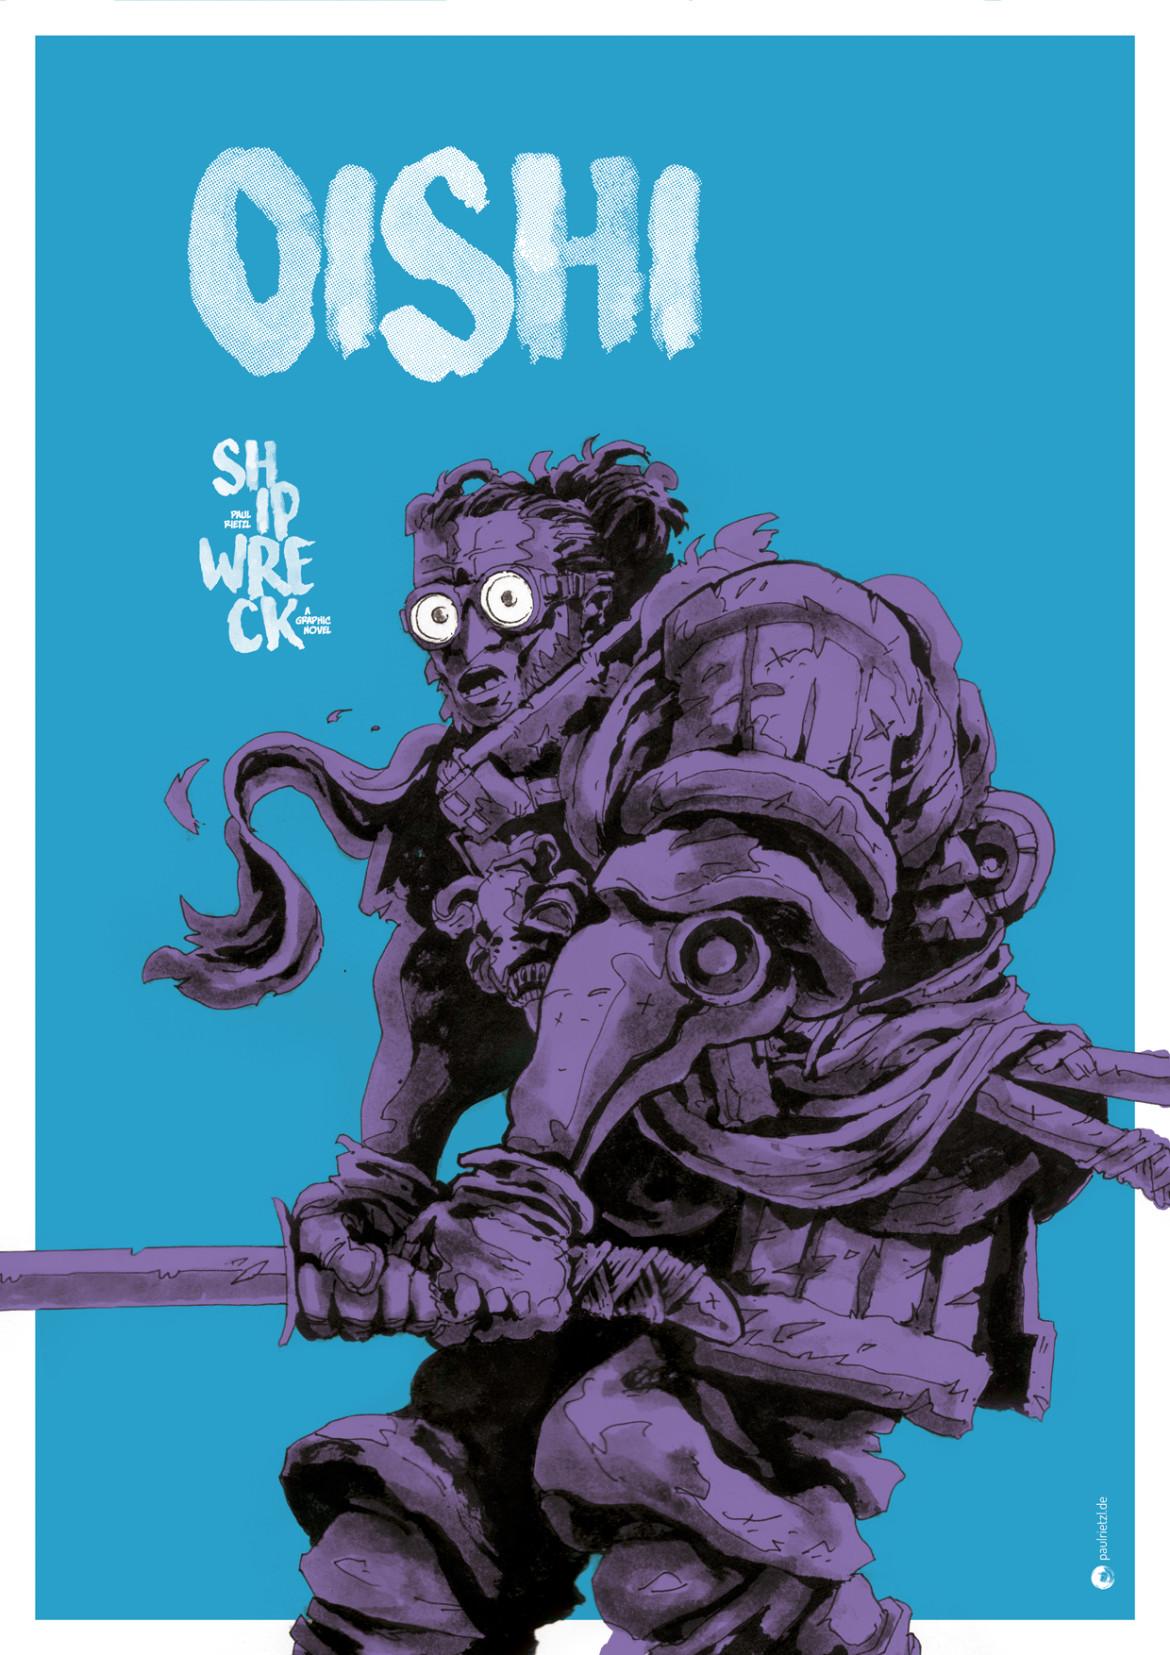 shipwreck_oishi_rz_promo